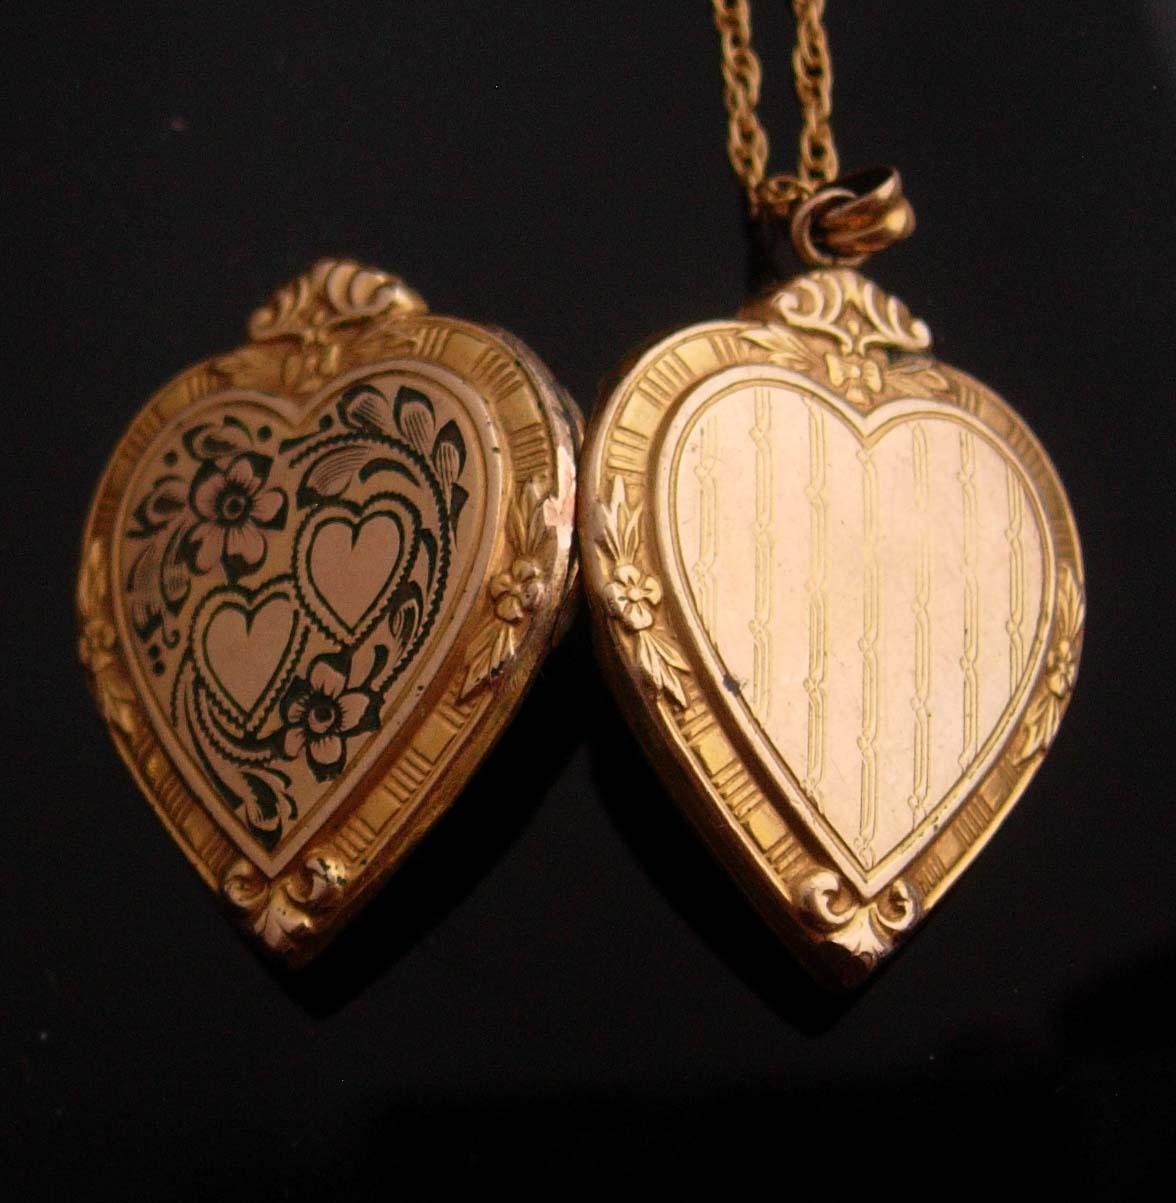 Victorian Locket yellow rose 1/20 12kt gold filled heart sweetheart photo locket